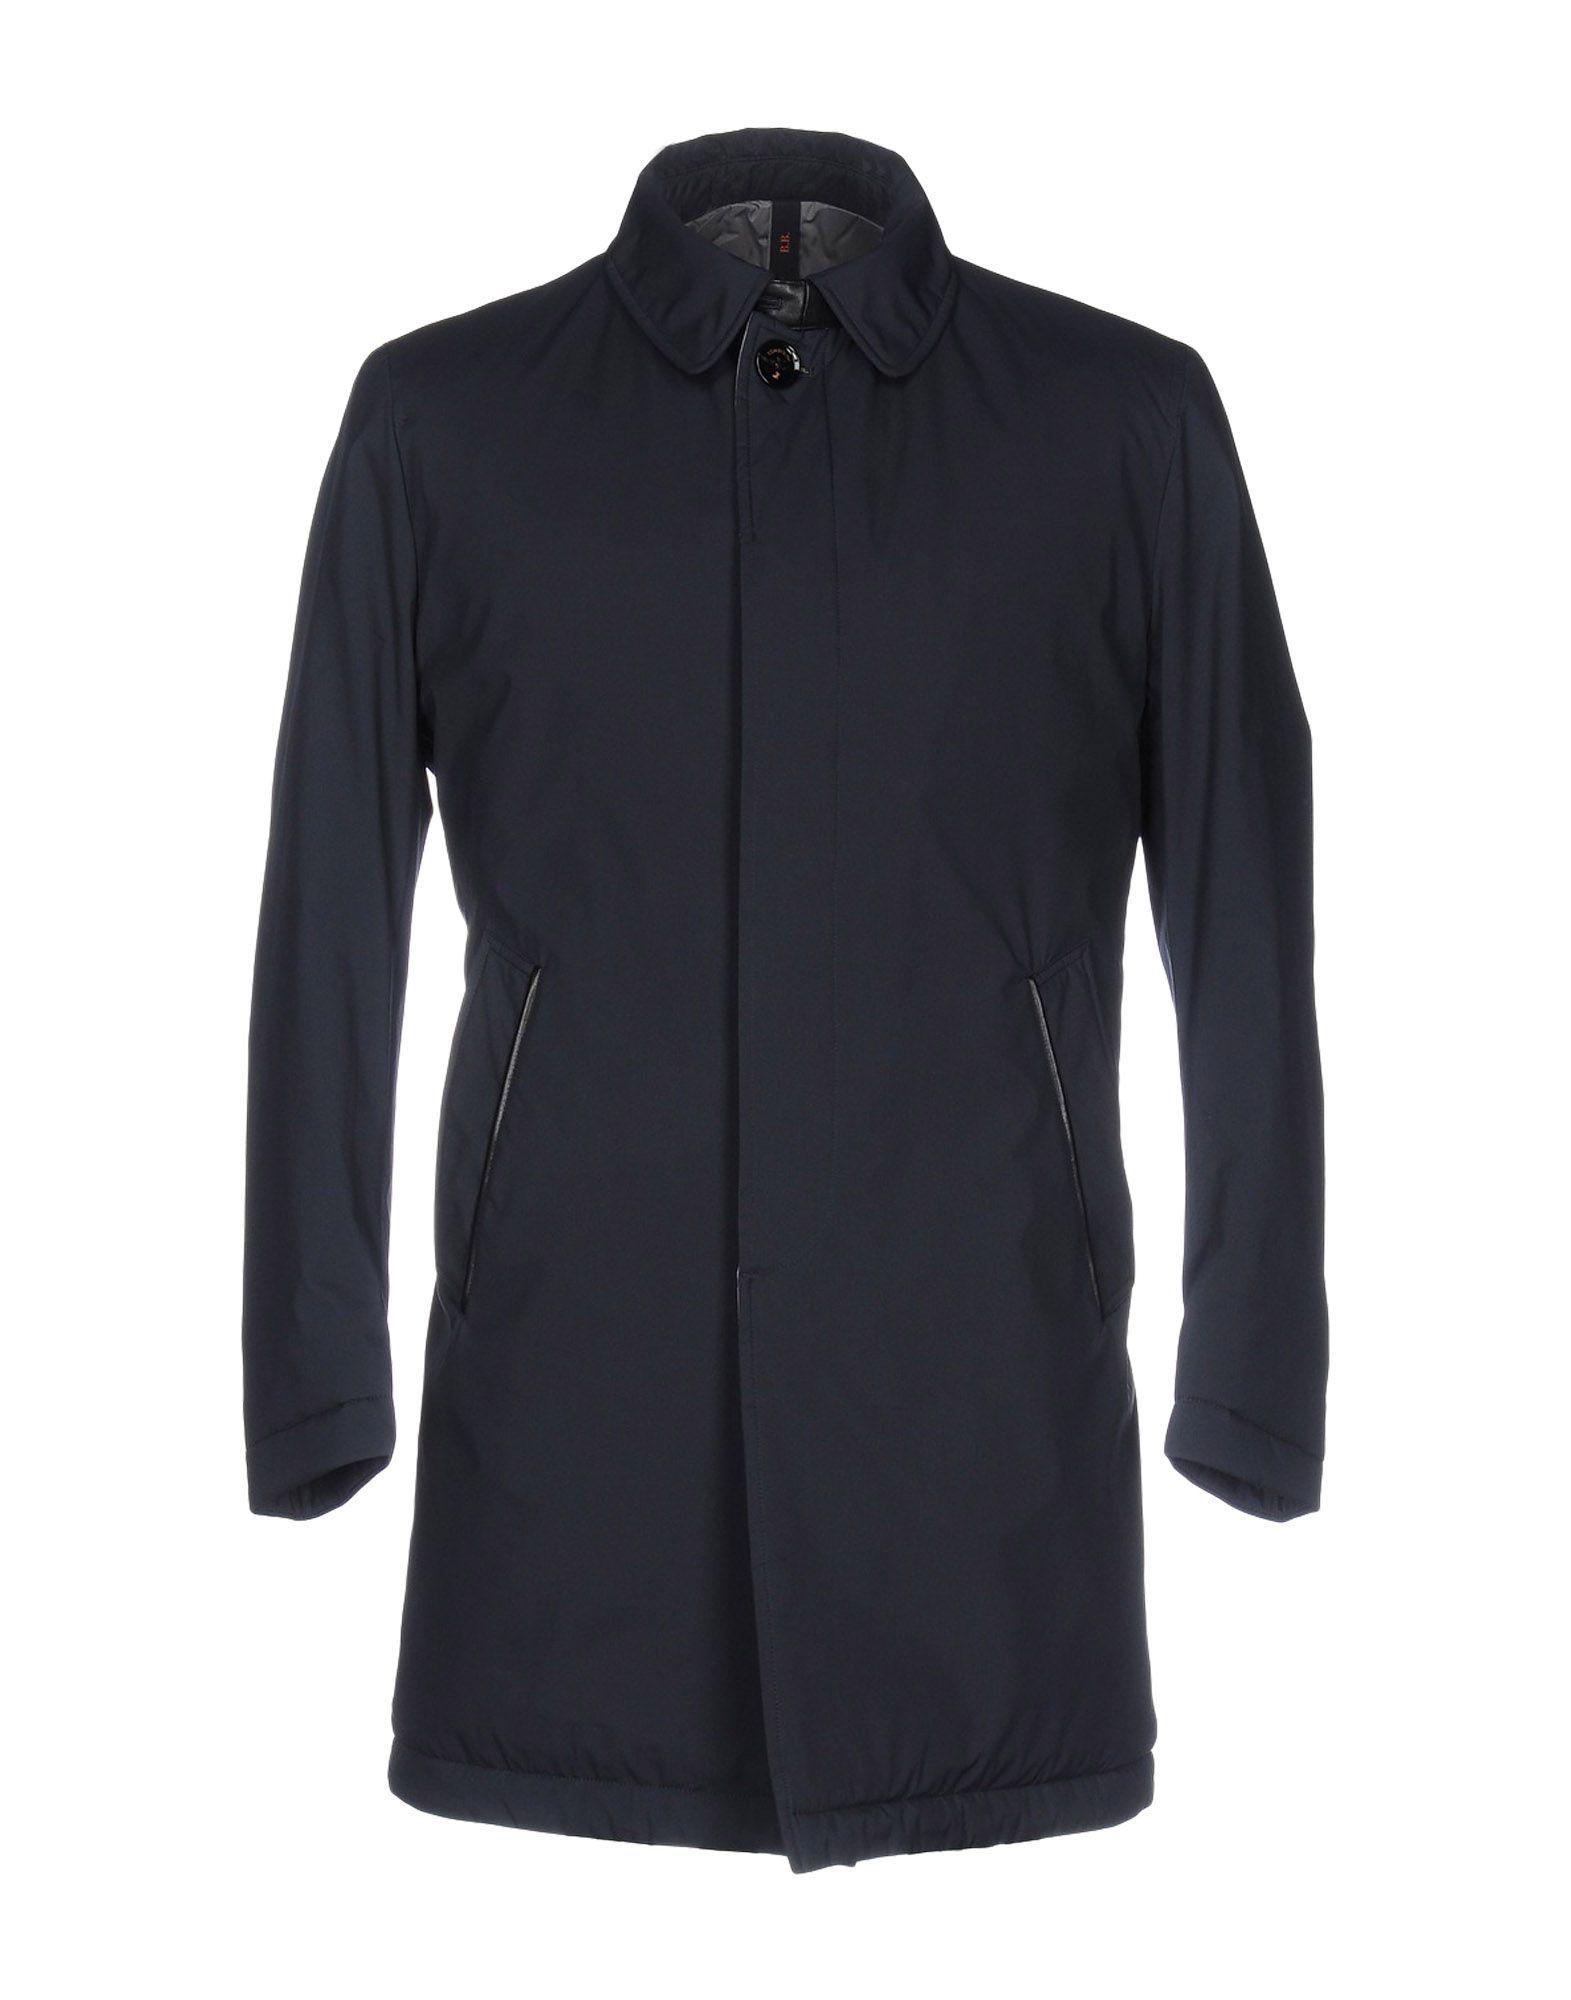 COATS & JACKETS Tombolini Dark blue Man Polyester